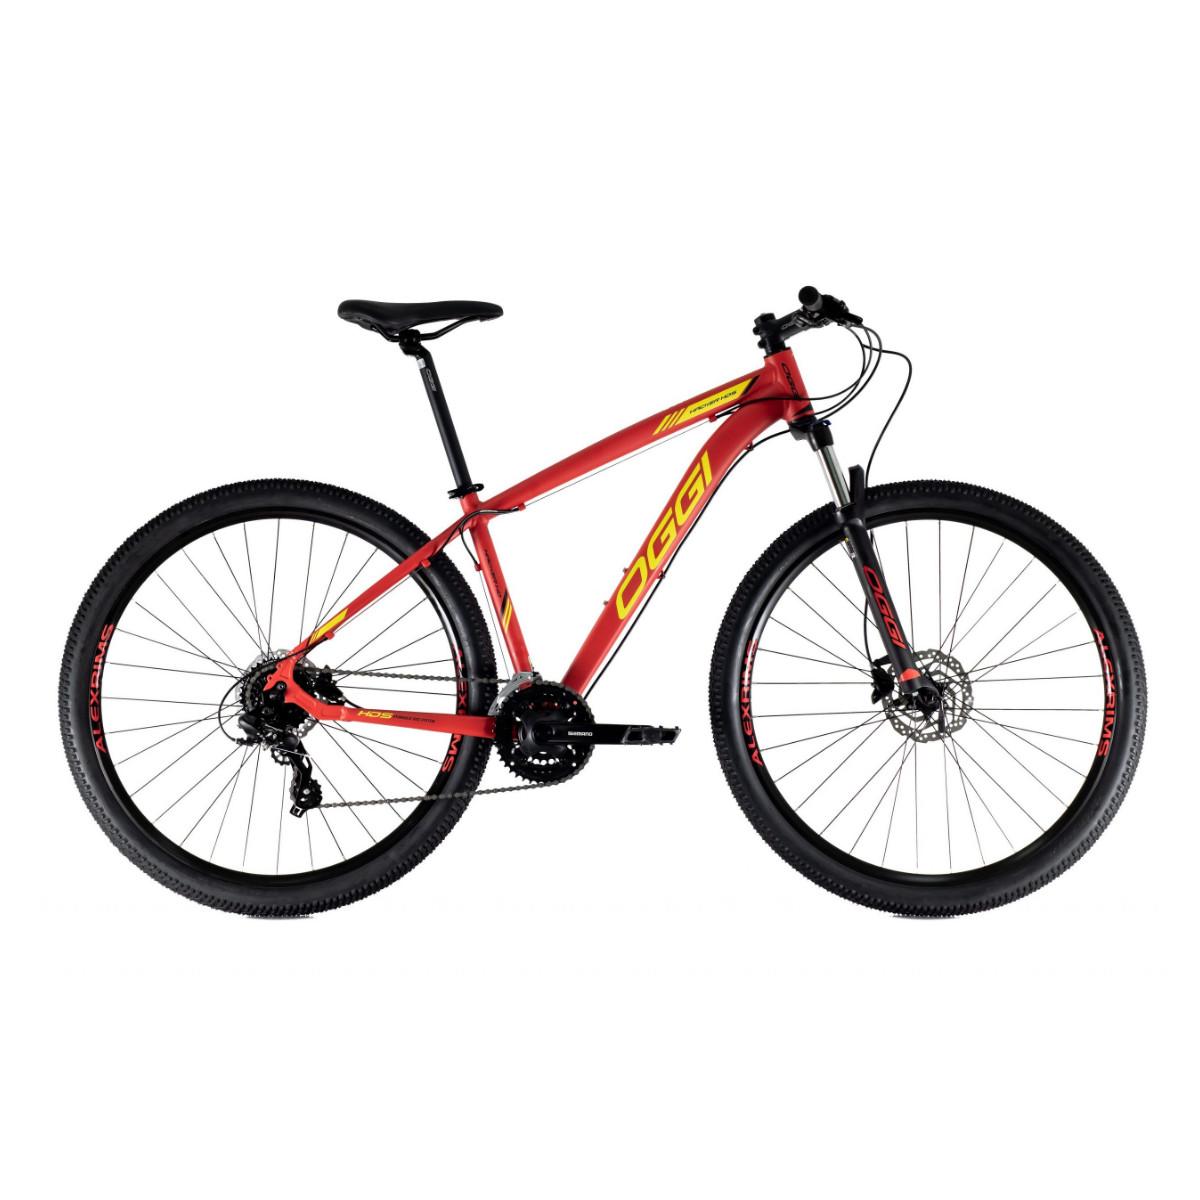 Oggi Hacker HDS 2021 - Vermelho Amarelo E Preto - Mountain Bike Aro 29